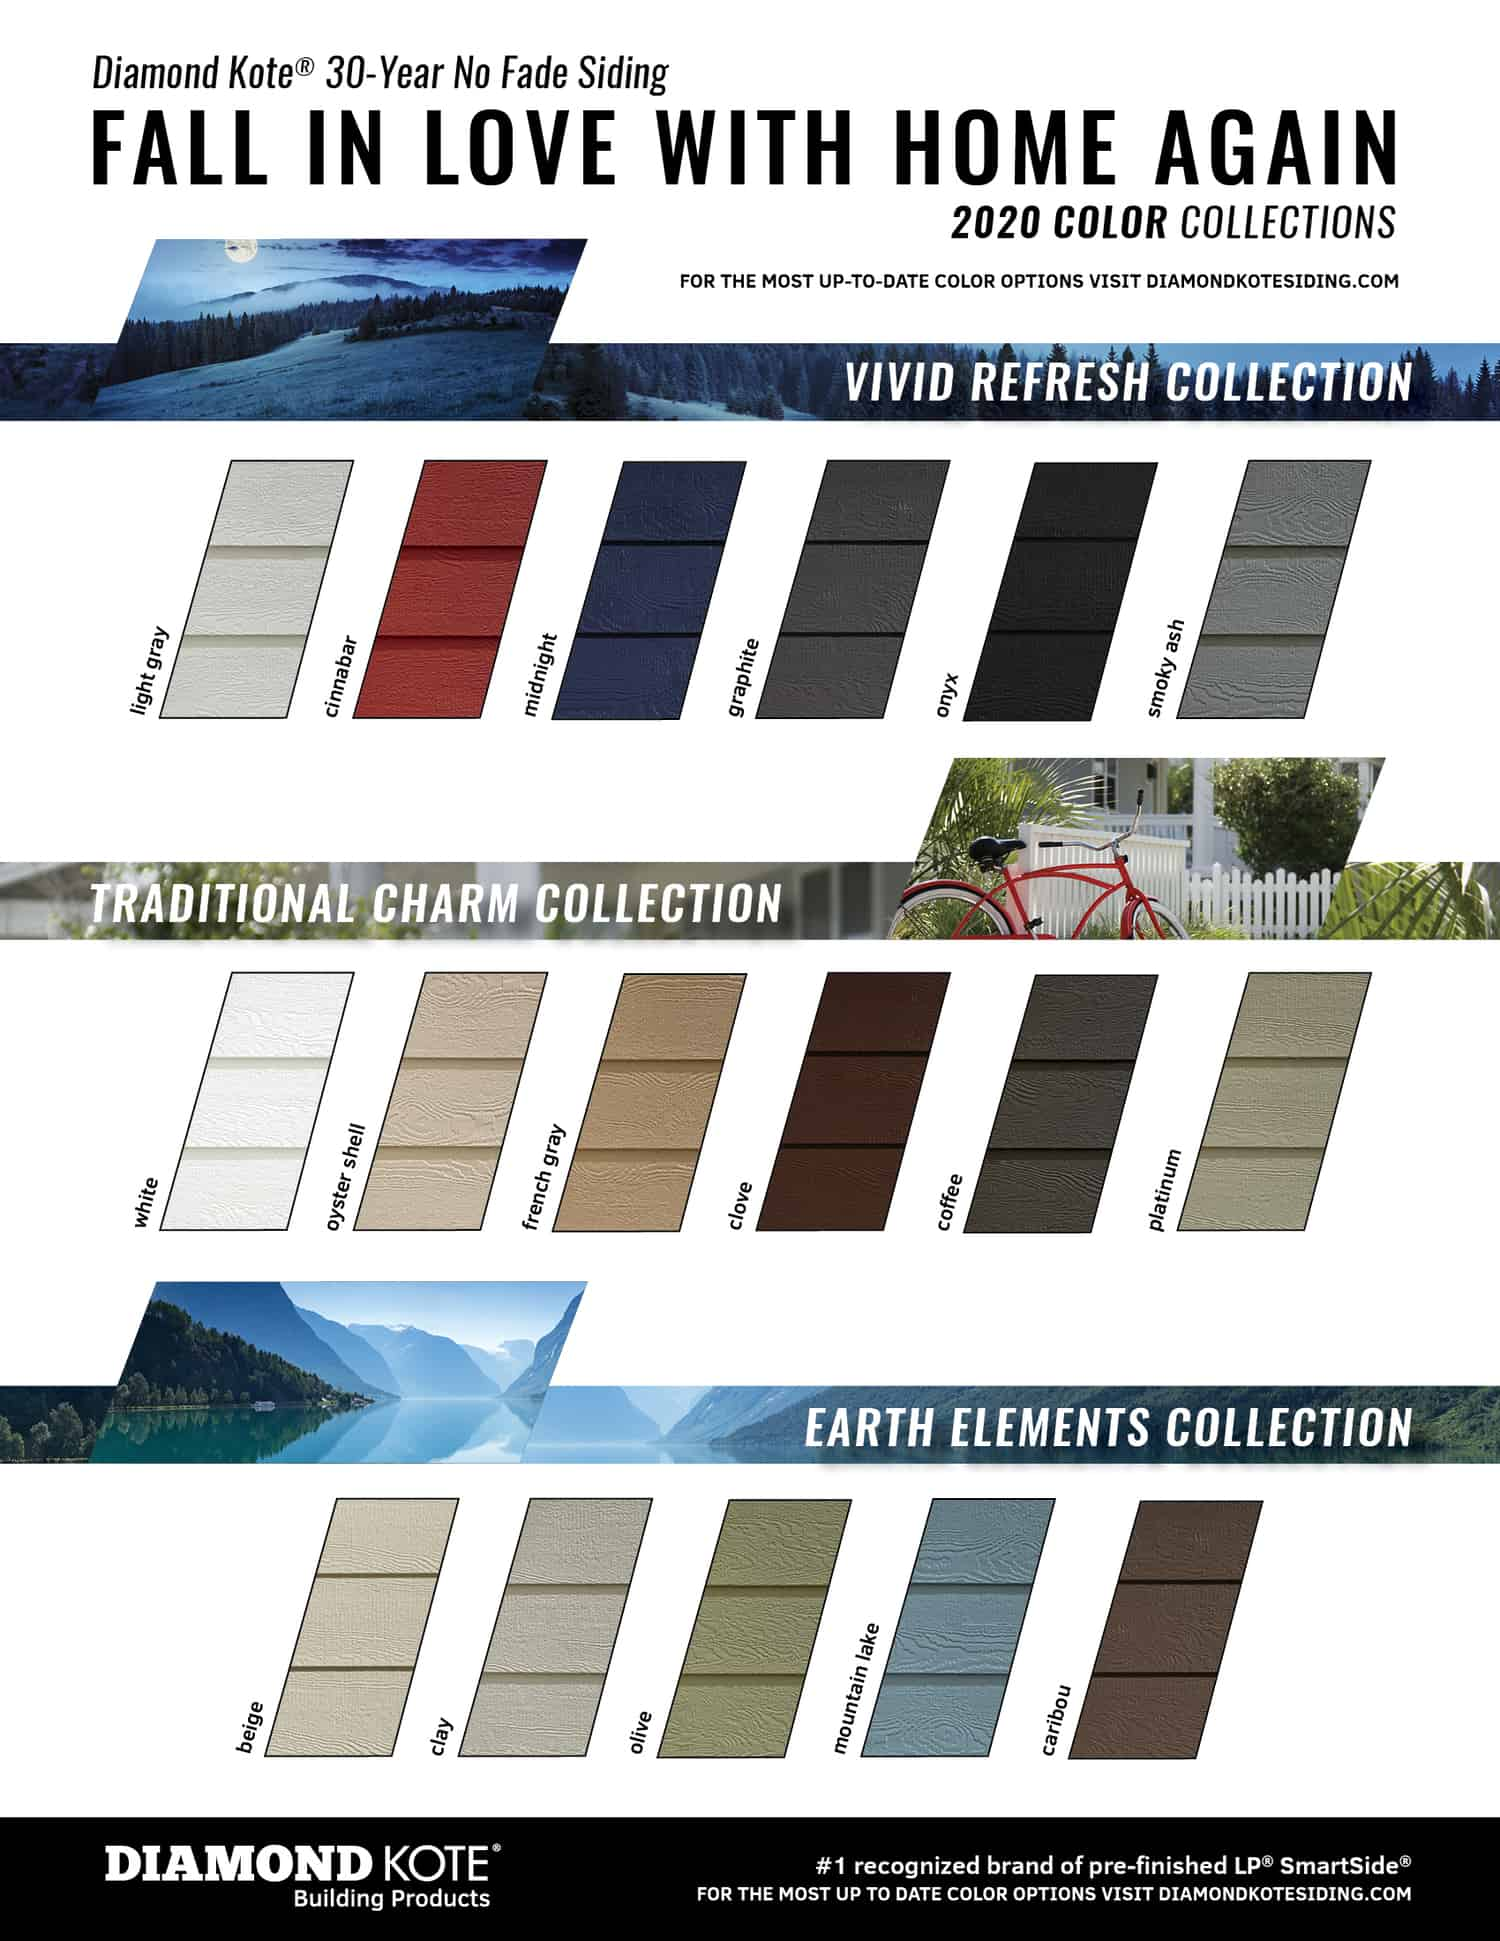 Diamond Kote Colors 2020 Collections